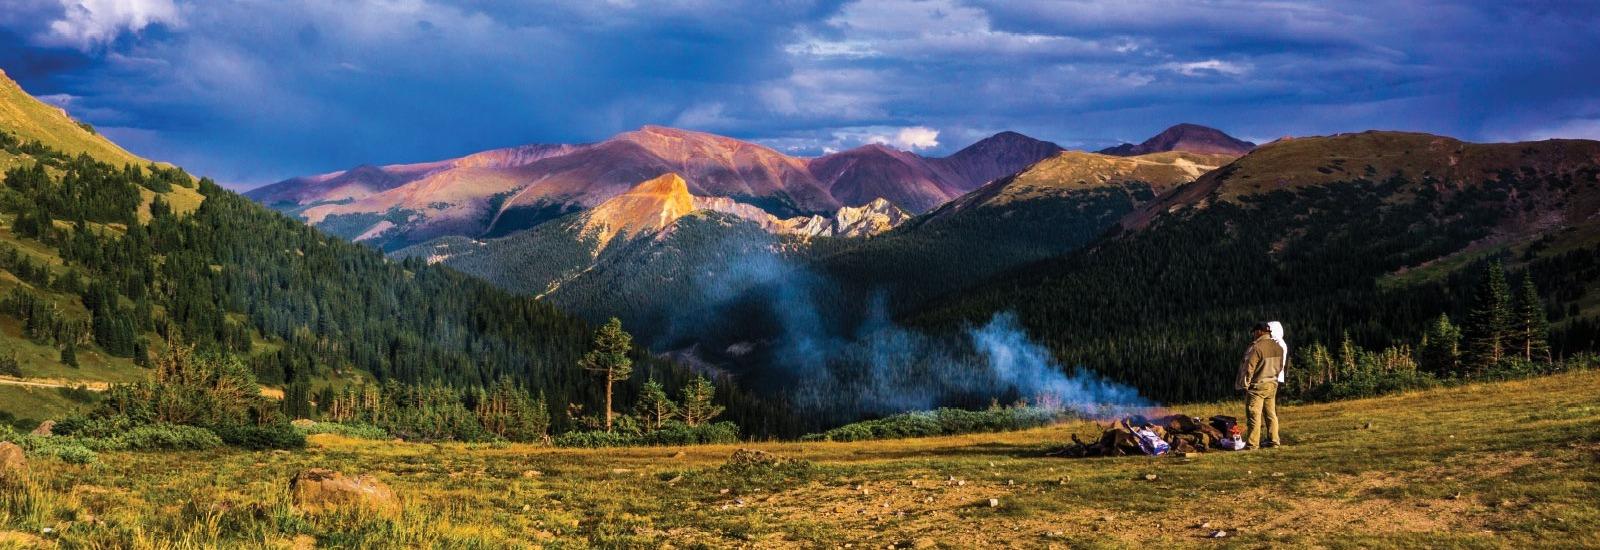 Jessica's Mountain Landscape